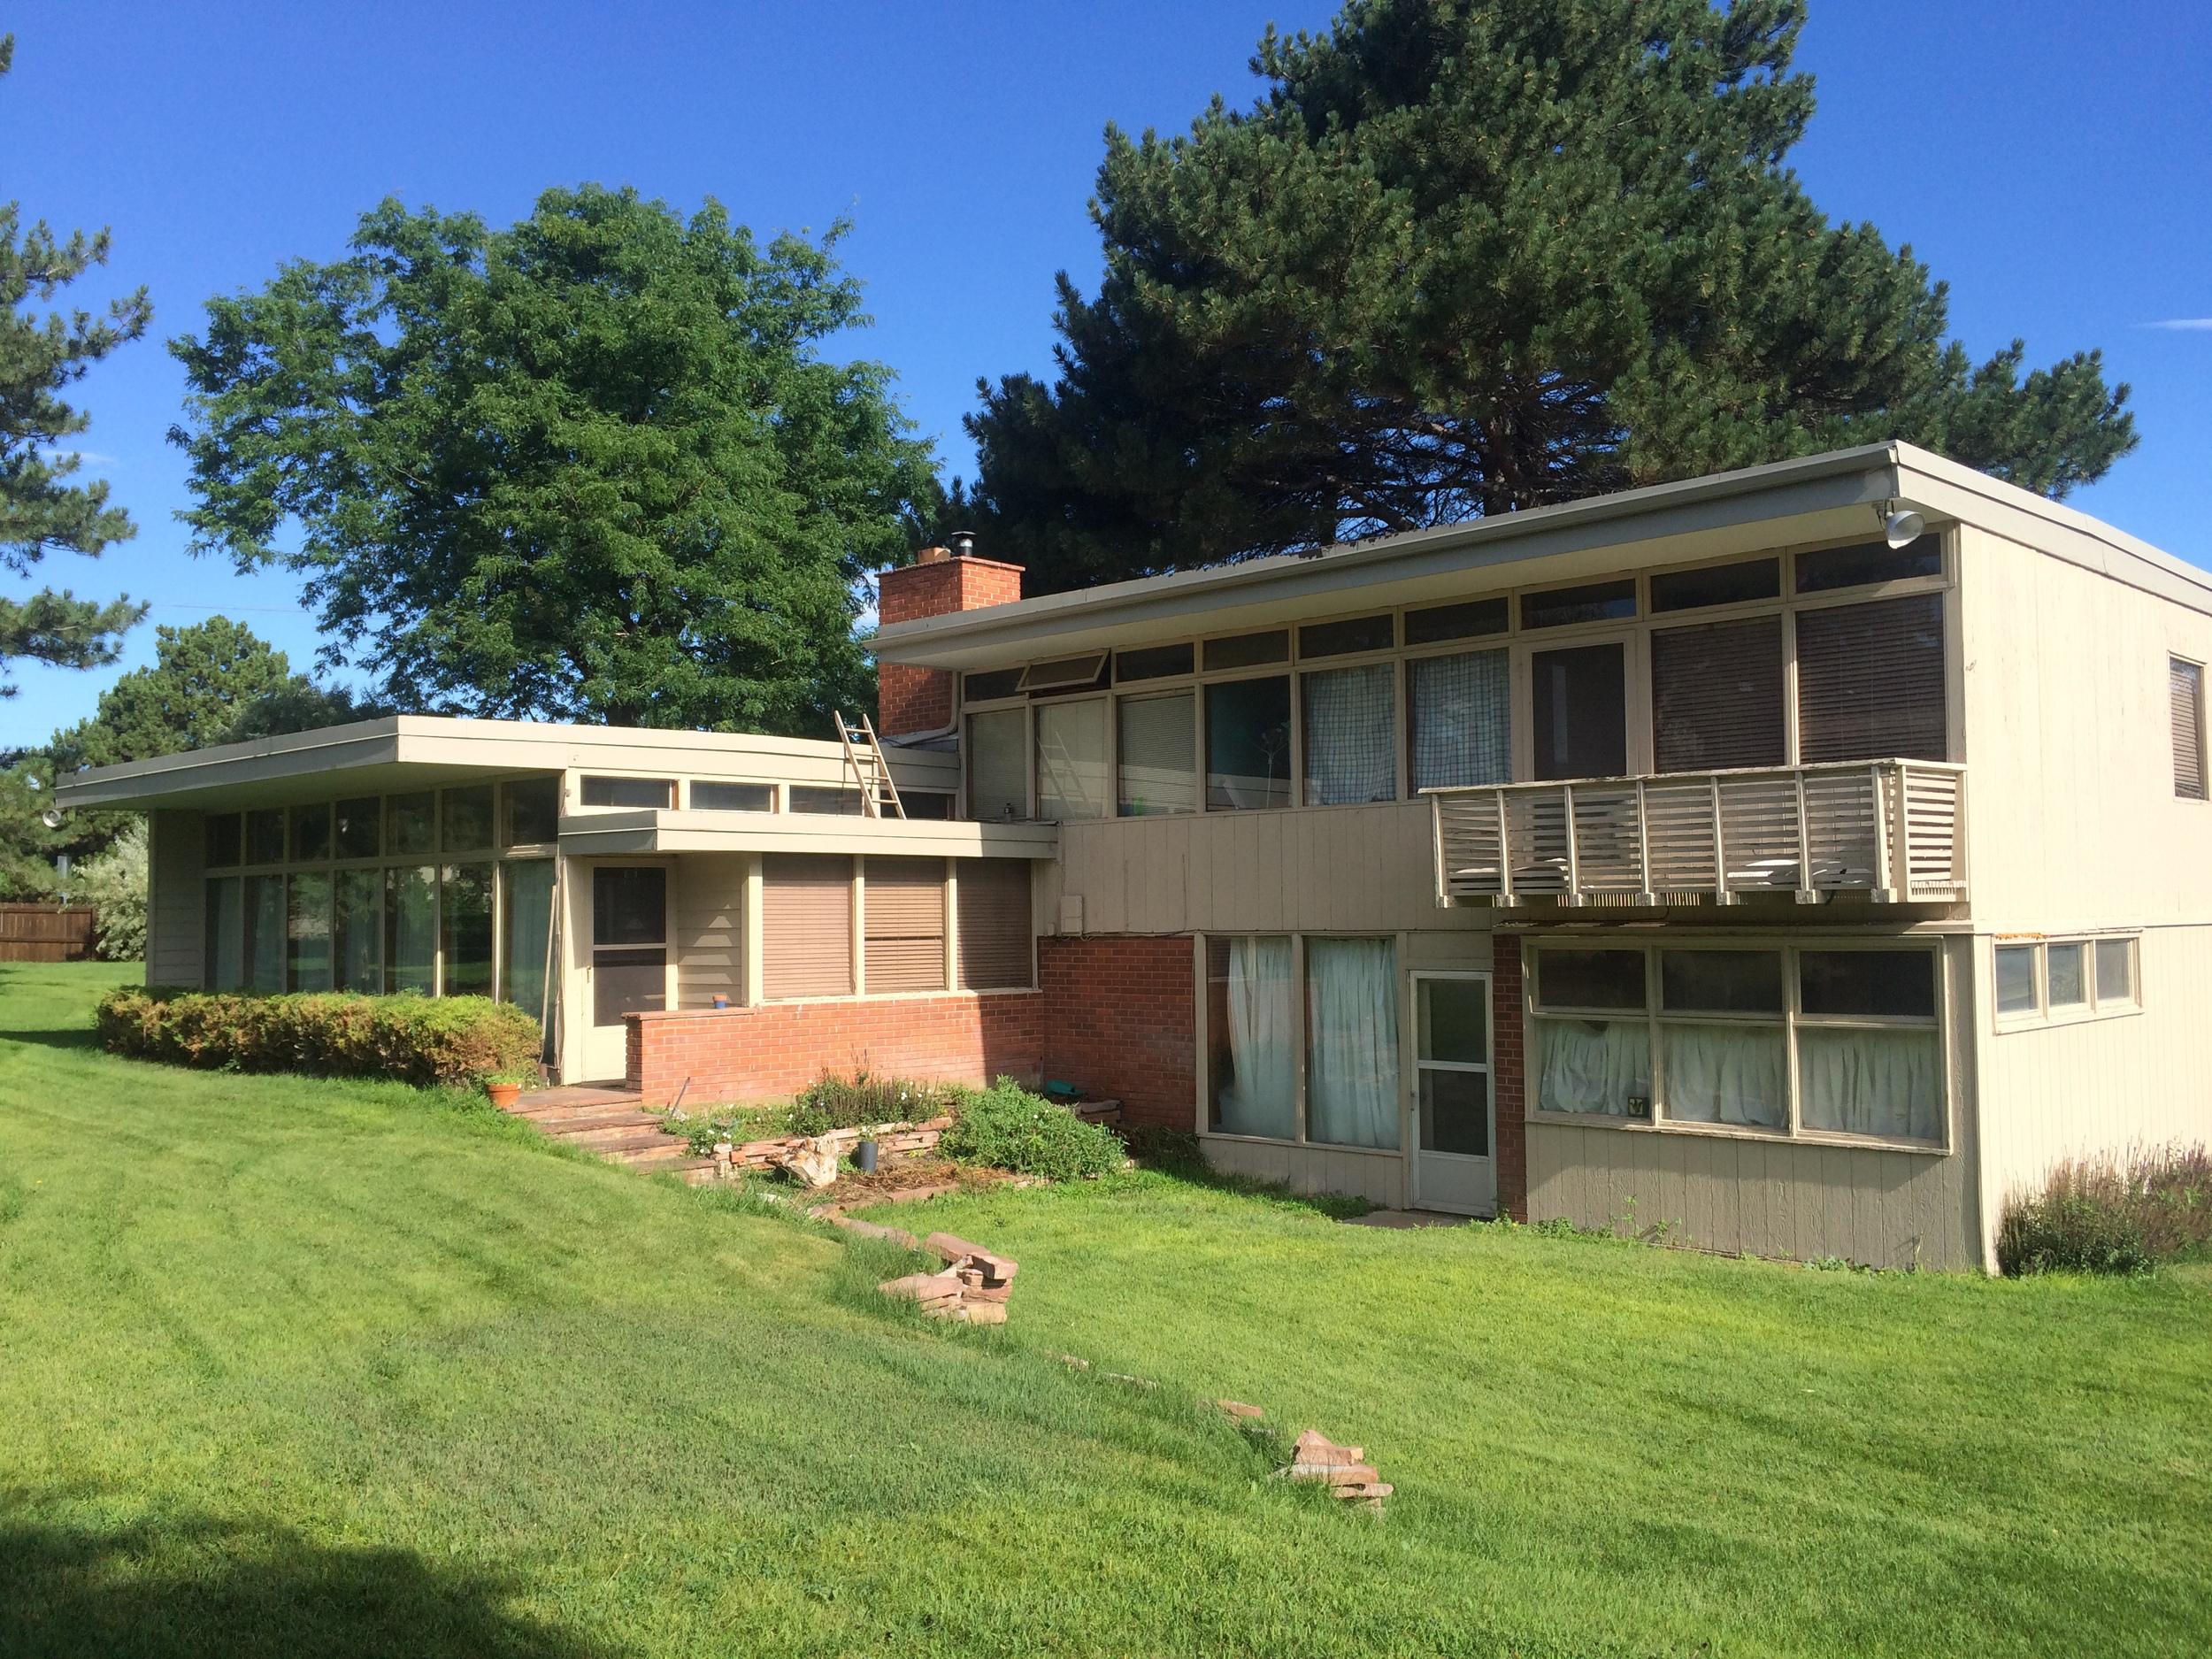 Robert Runnells Residence - Greeley Colorado - Architect, David B. Runnells